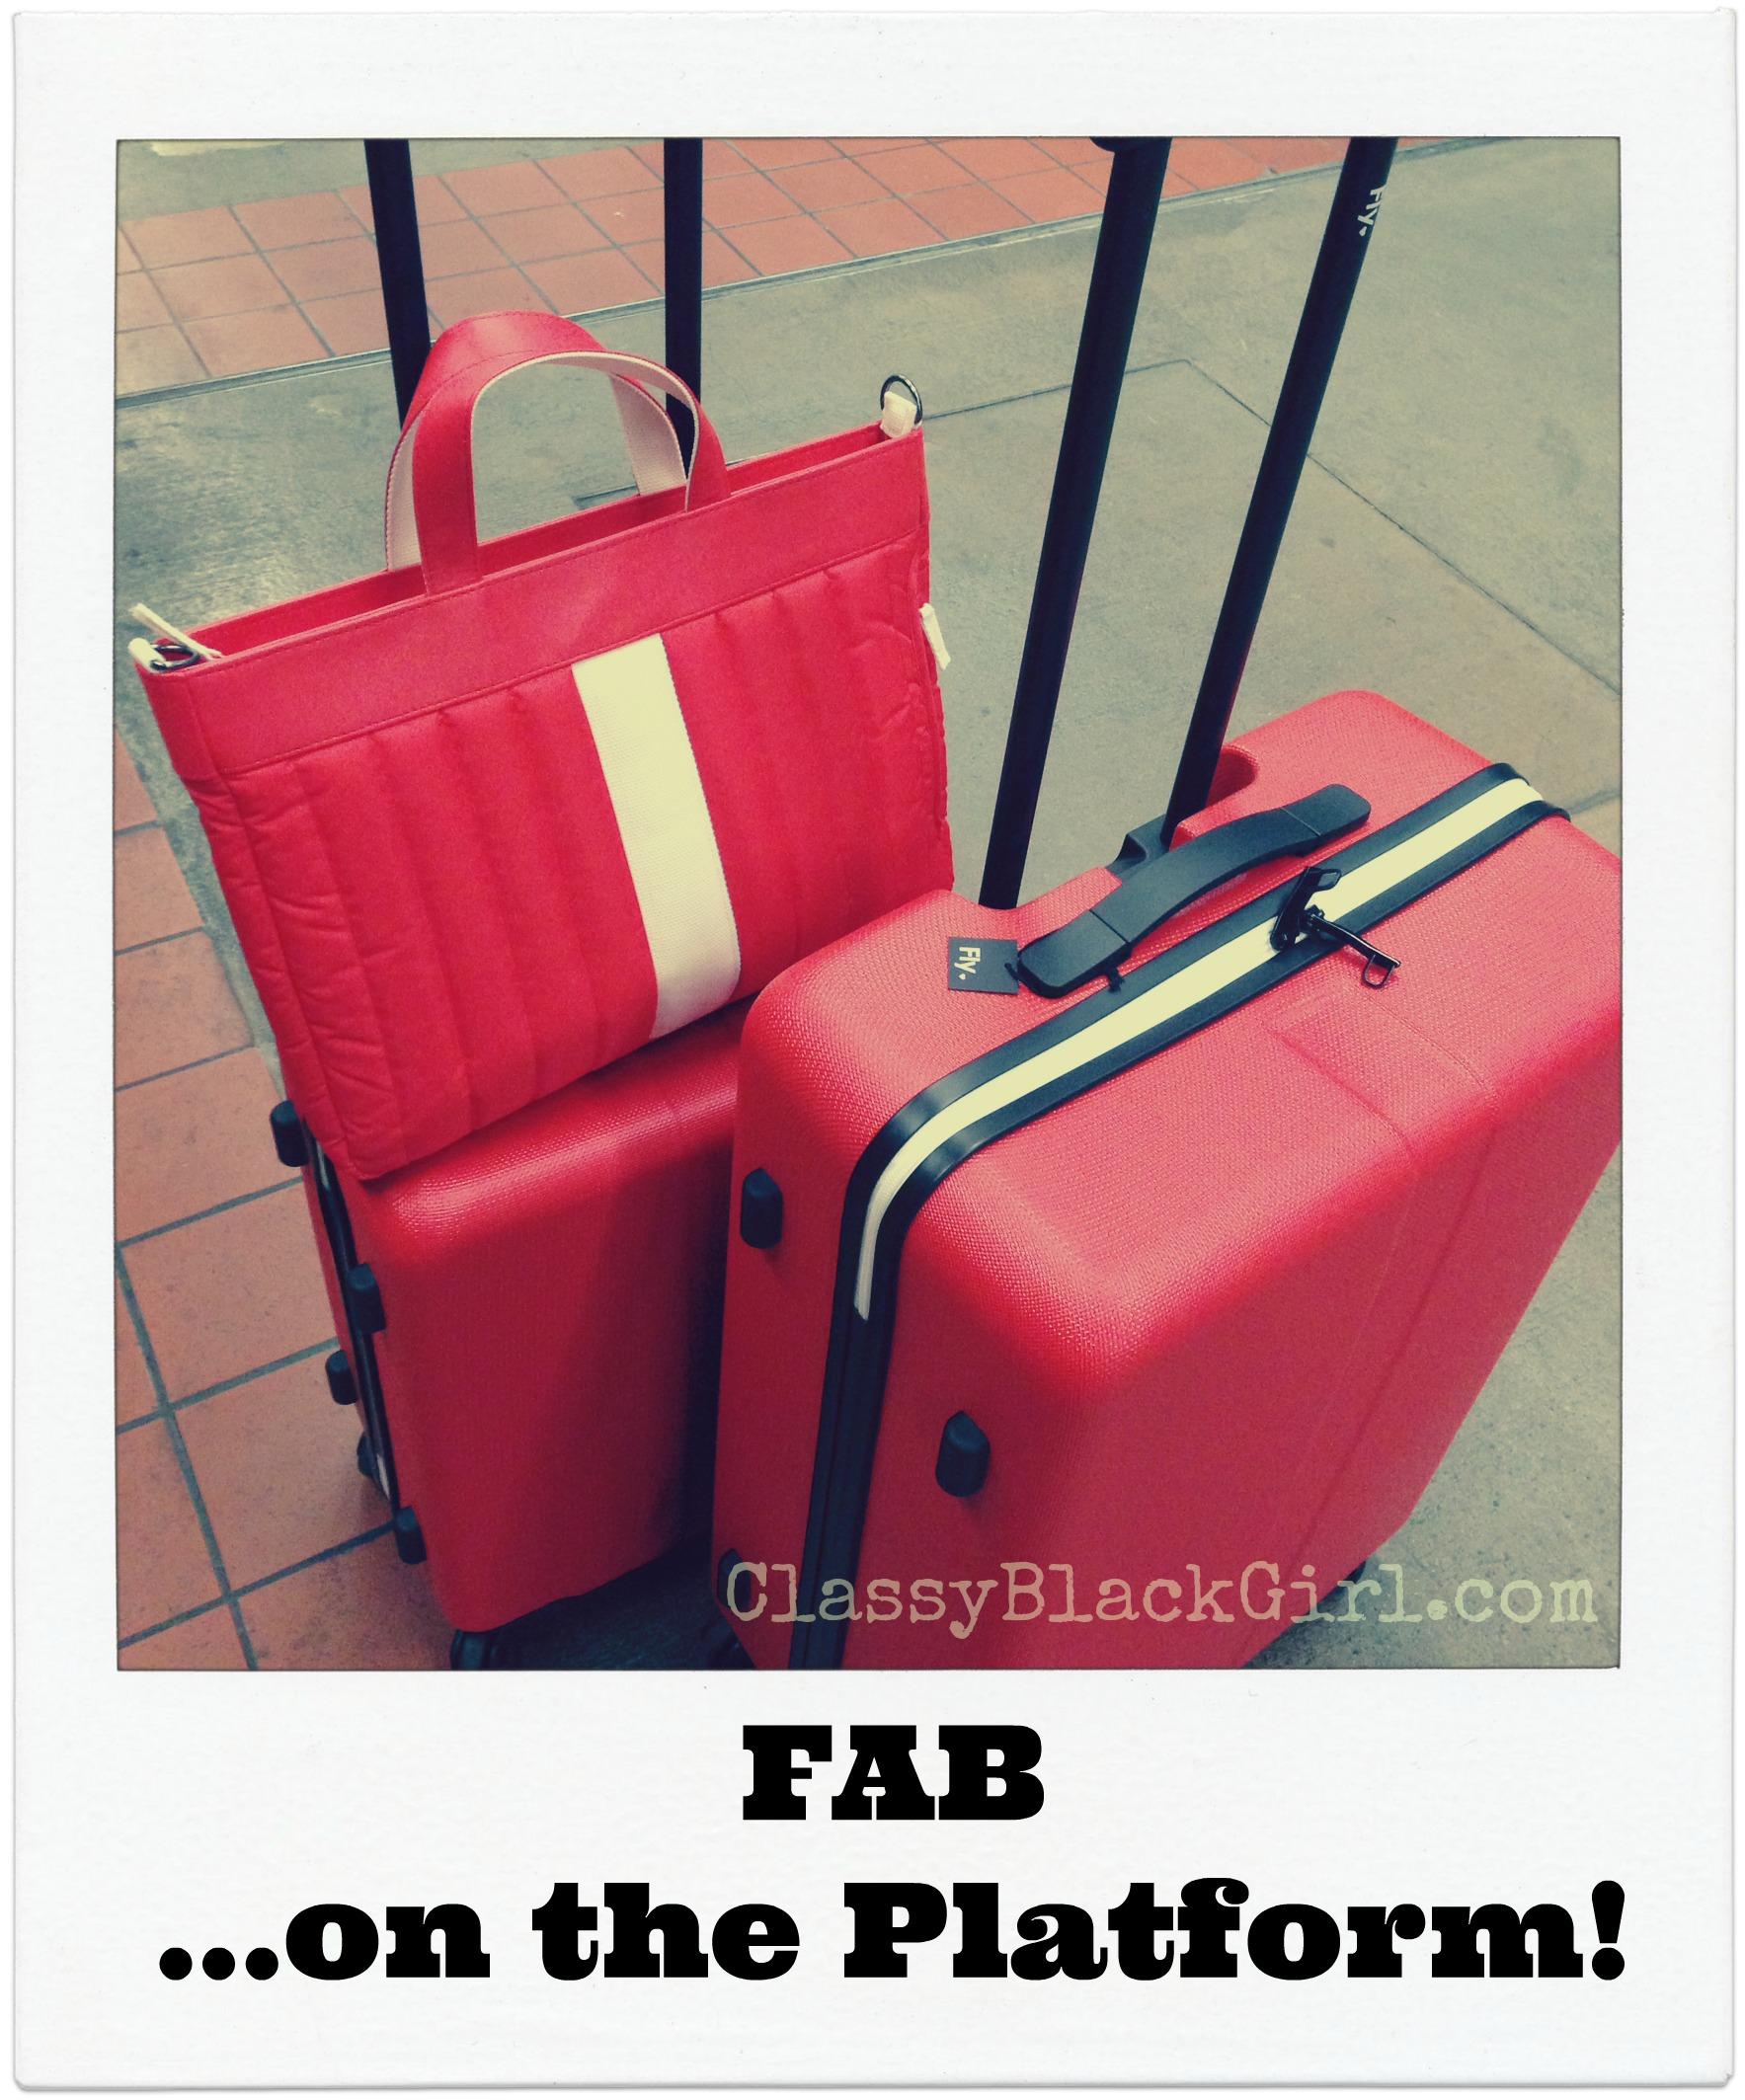 FAB-Luggage-Classy-Black-Girl-ClassyBlackGirl-Travel-BlackTravel-CBG191310